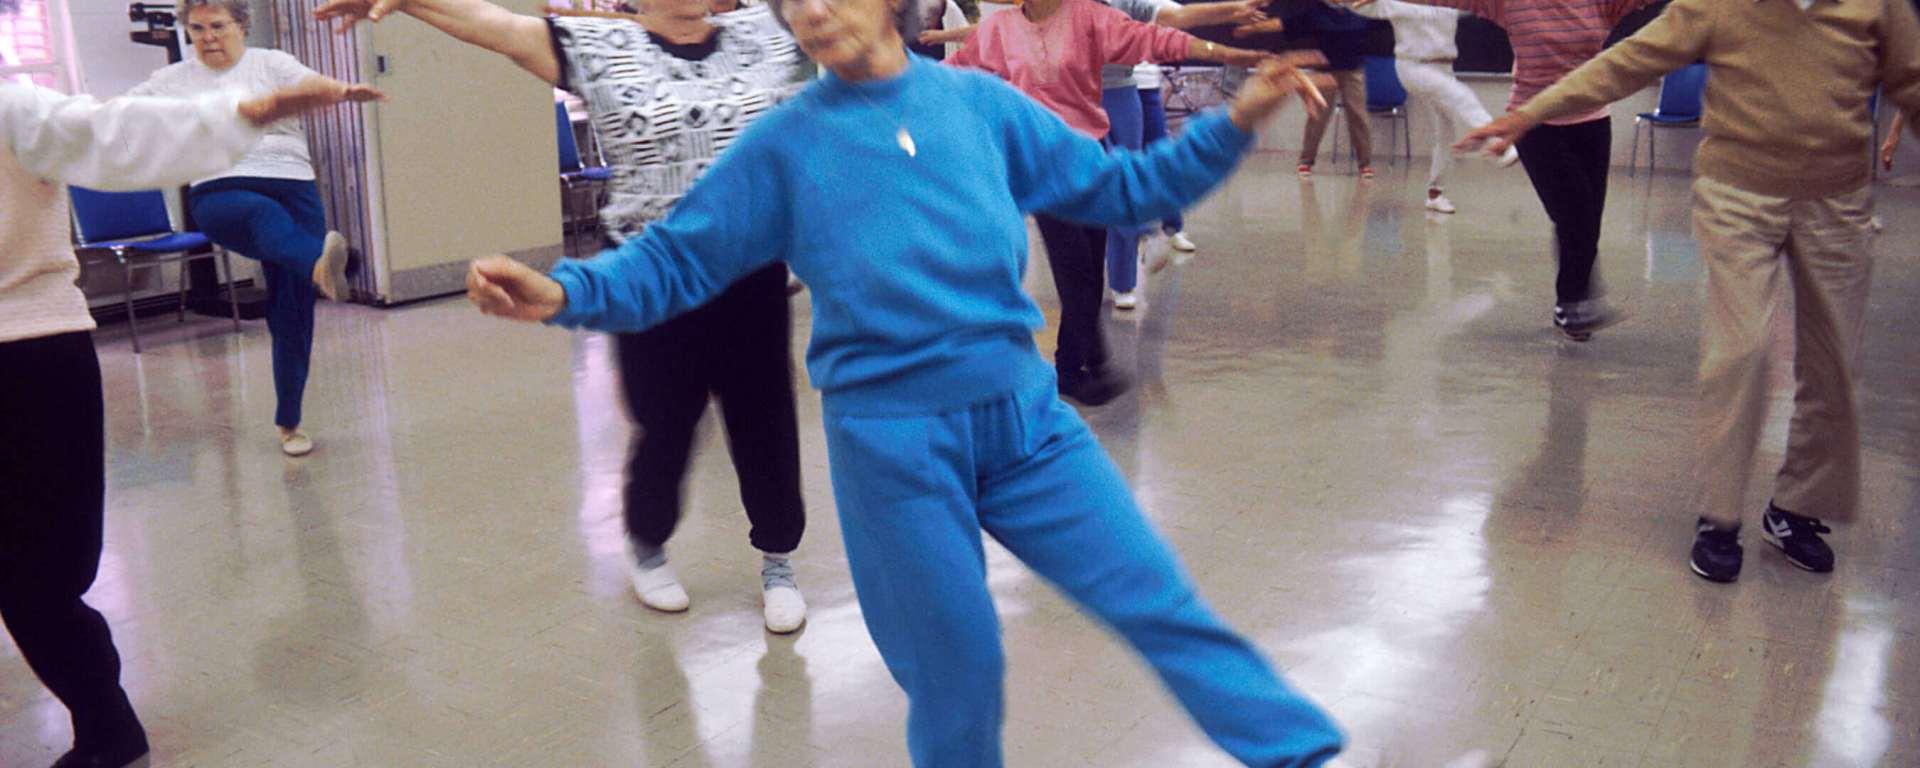 Elderly people exercising to music